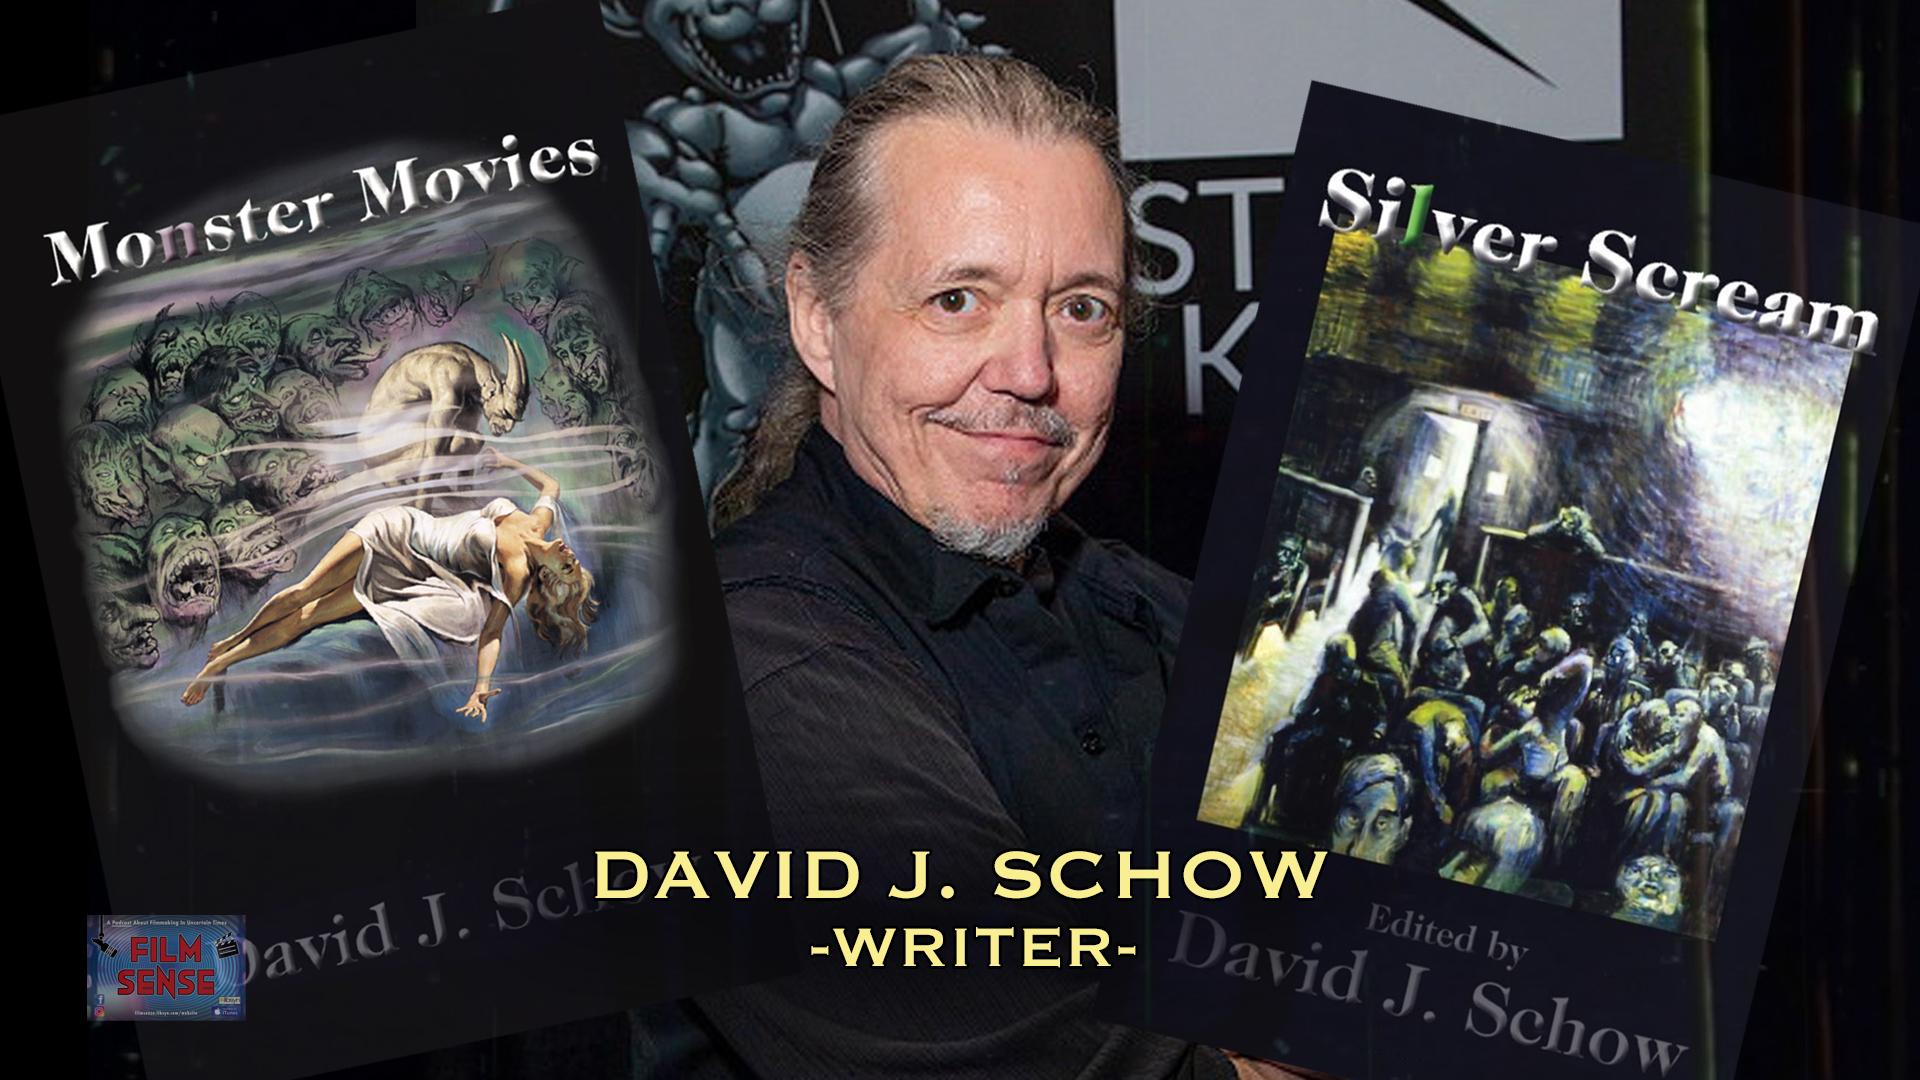 David J. Schow